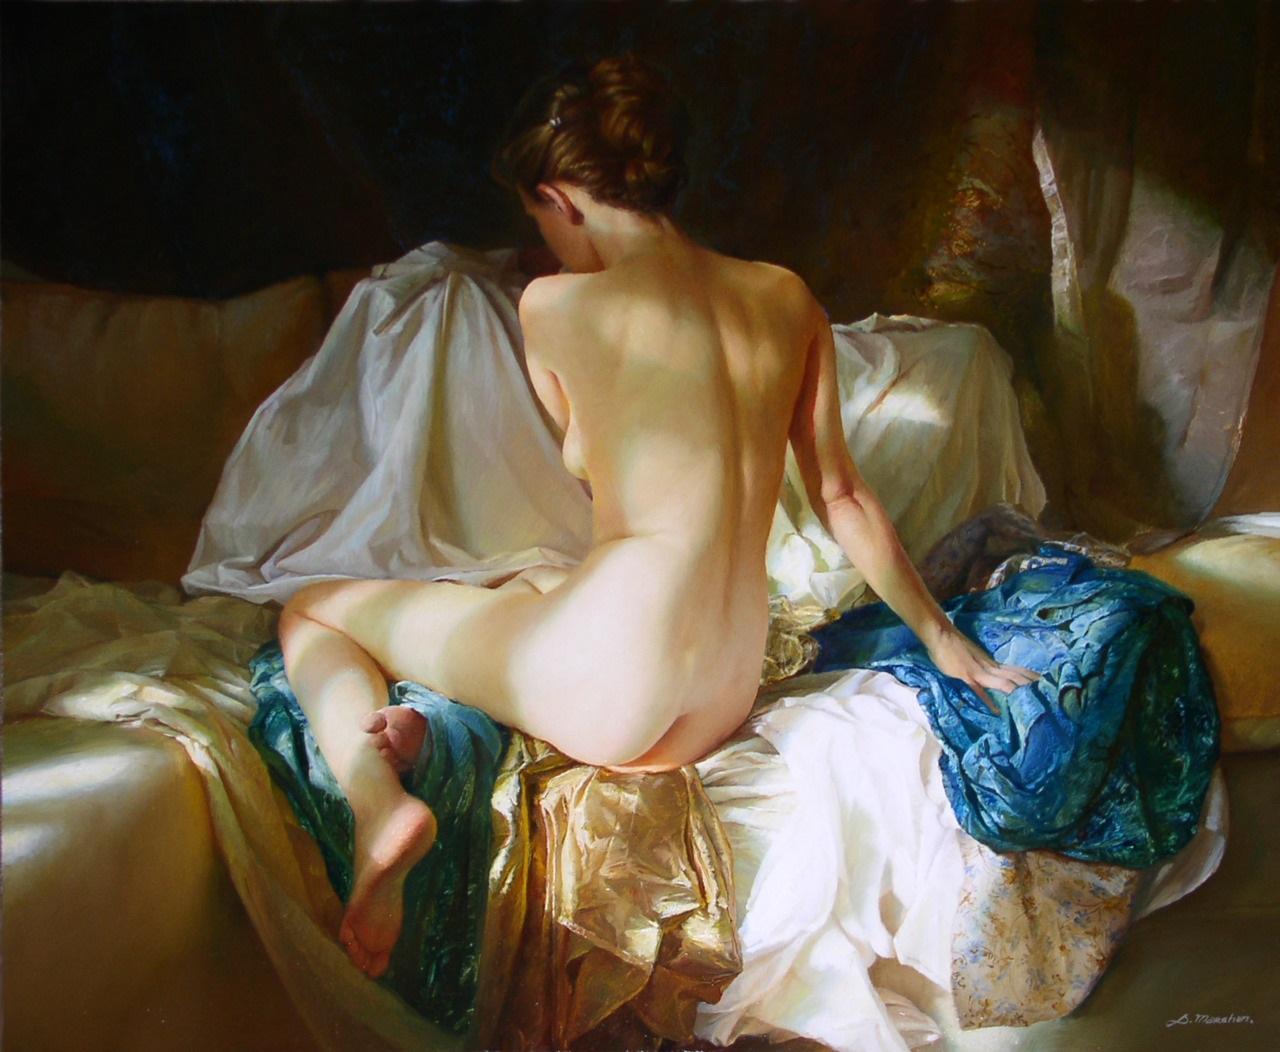 Women's images by a Russian realist artist Sergey Marshennikov - 07